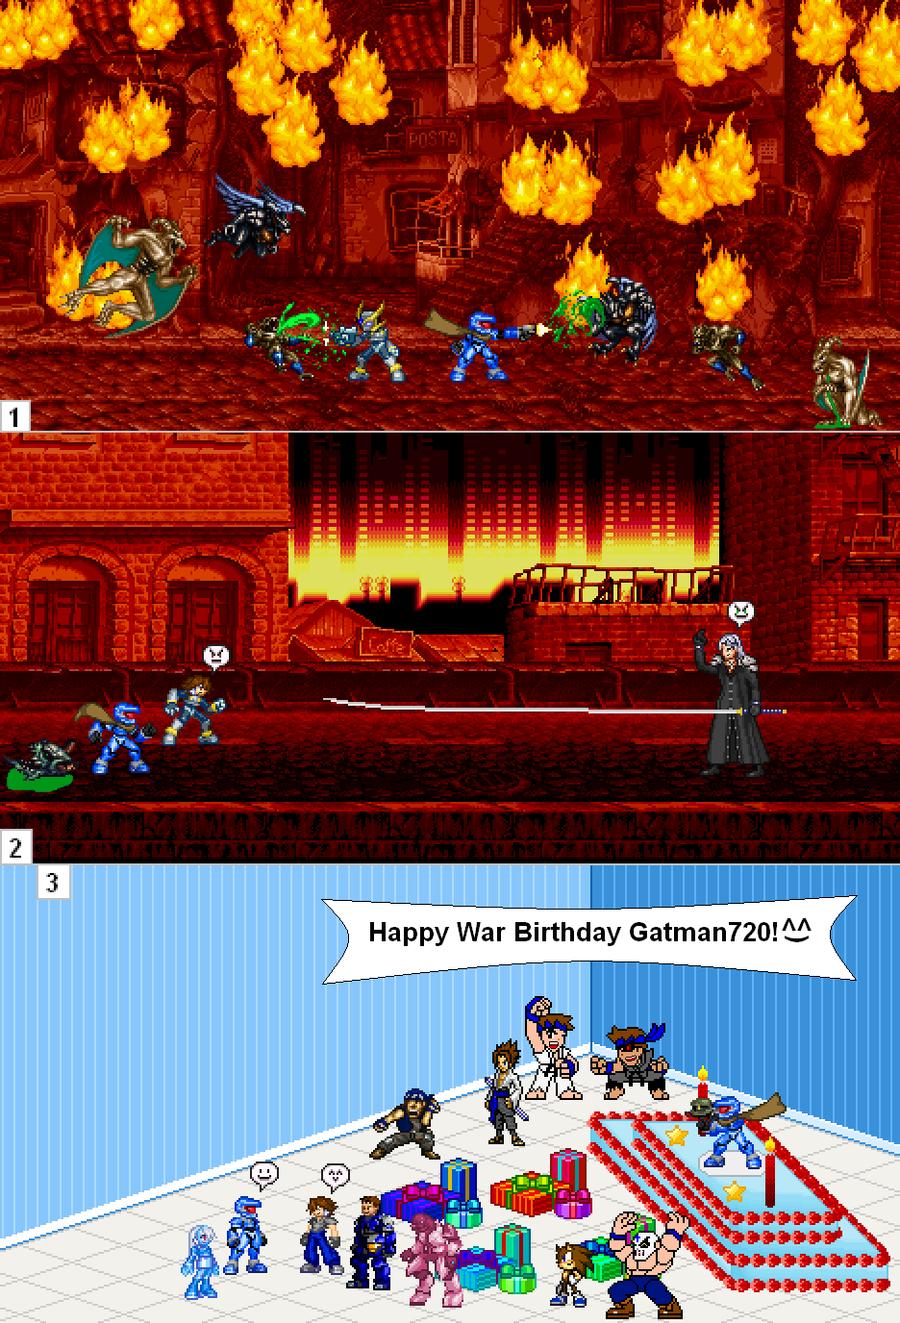 Happy War Birthday Gatman720 by Darkblane257